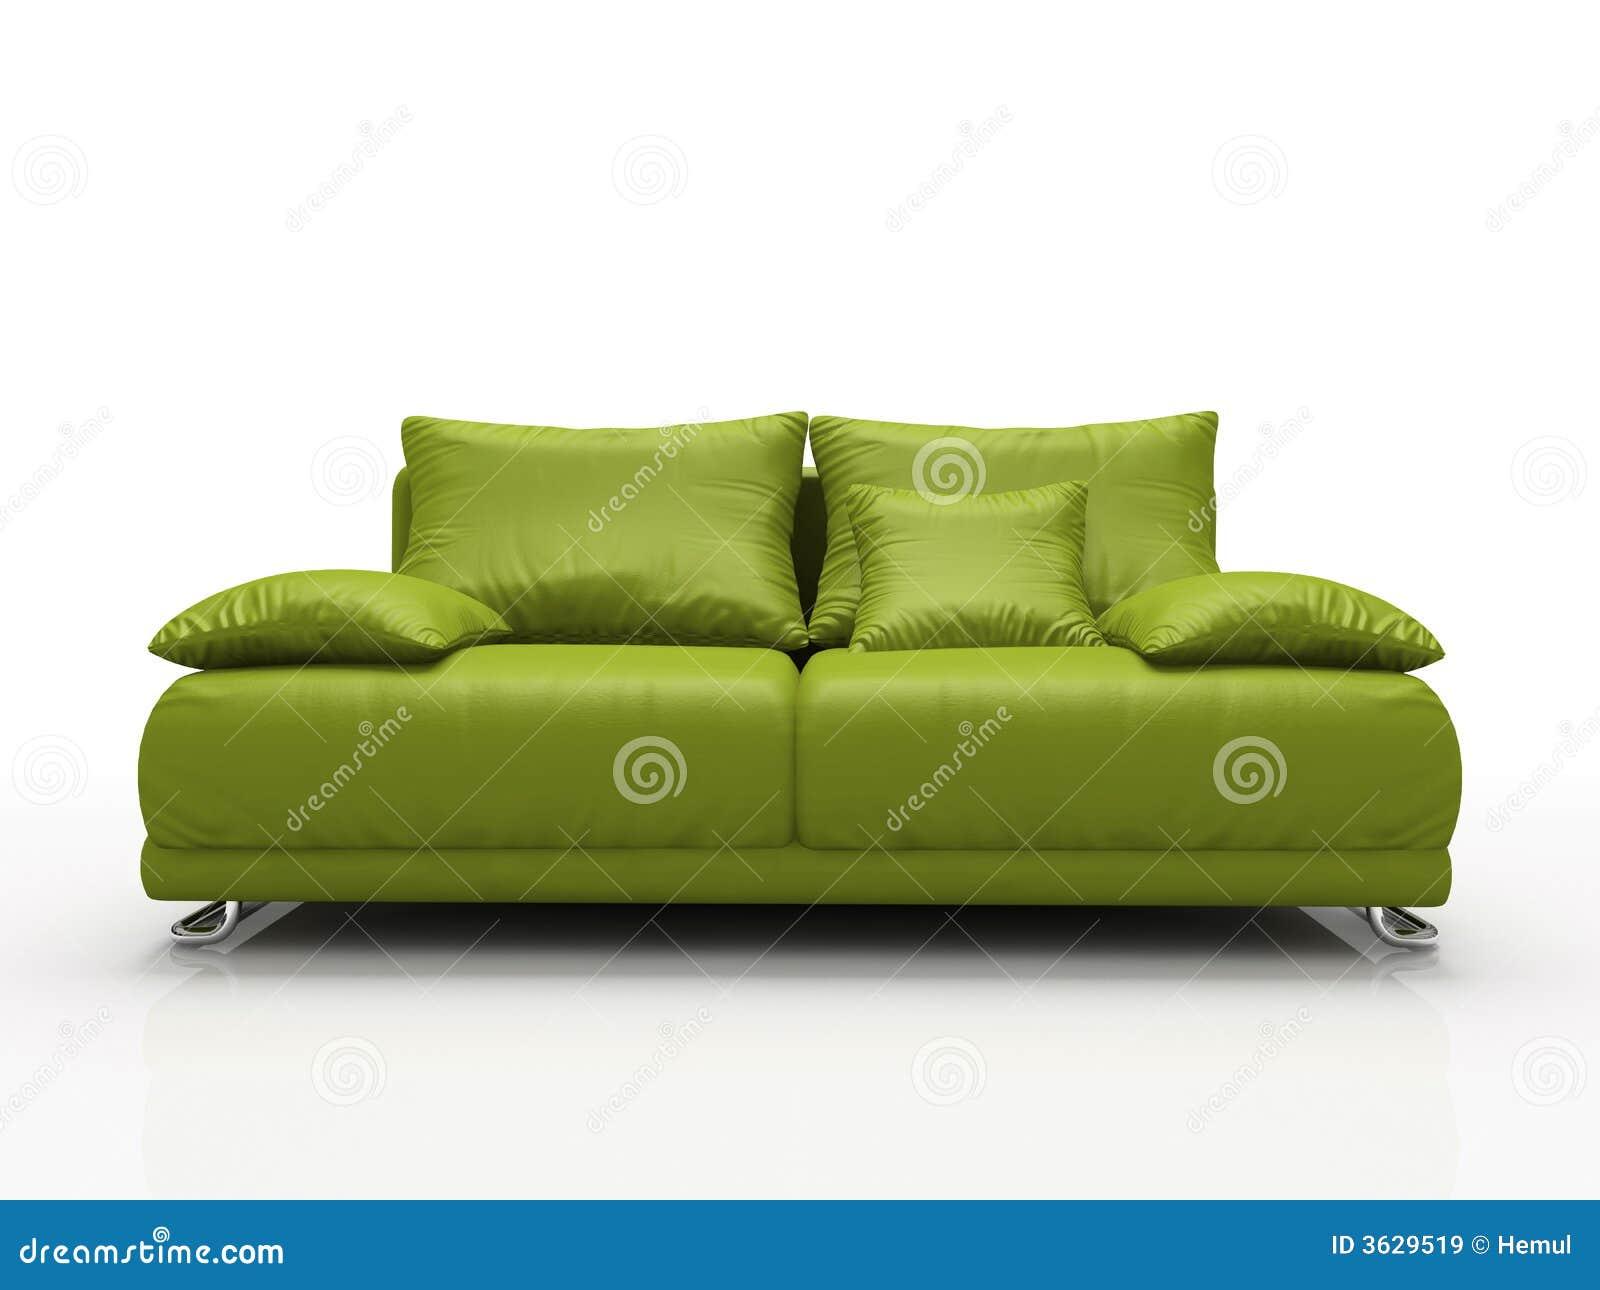 sofa en cuir vert images libres de droits image 3629519. Black Bedroom Furniture Sets. Home Design Ideas